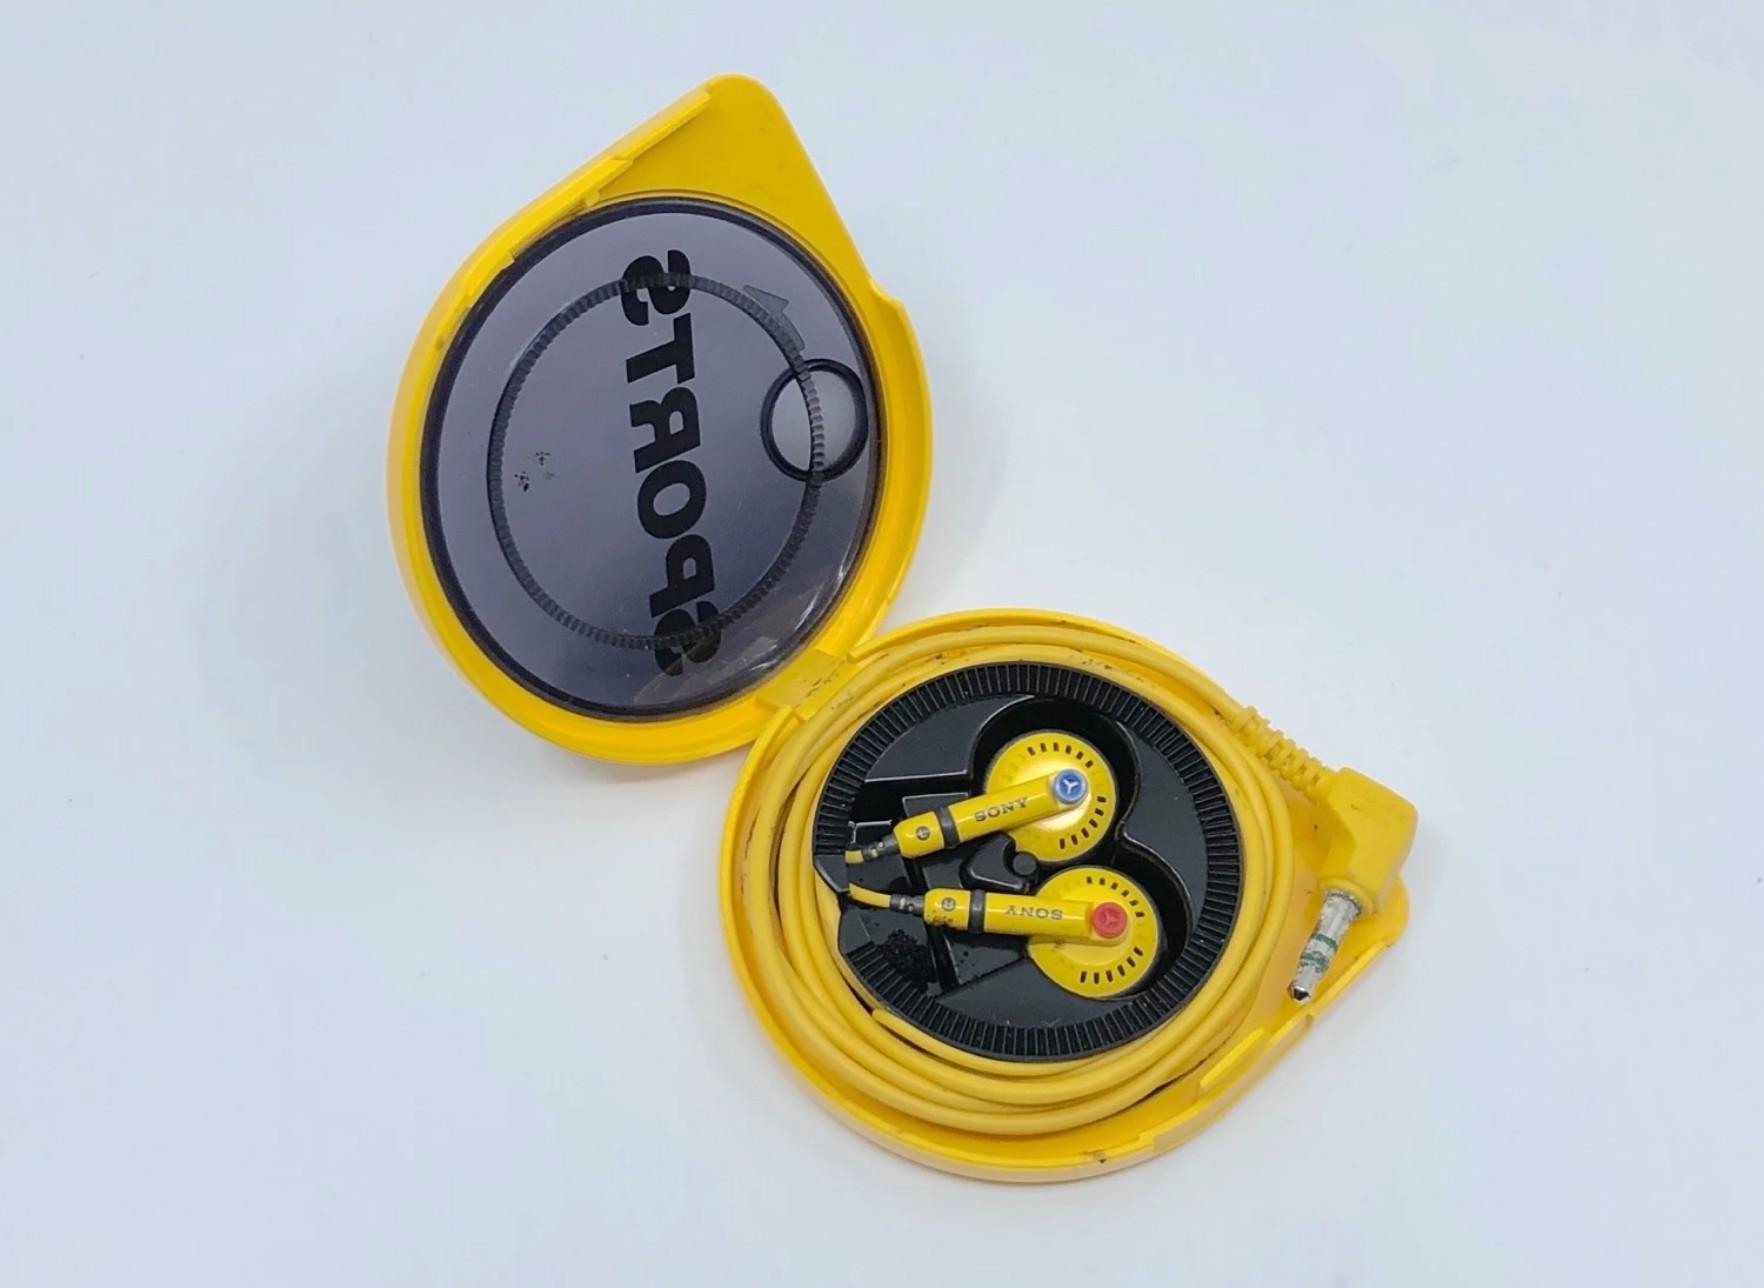 https://www.just-cassette.com/post/sony-solar-sports-walkman-wm-f107-portable-cassette-player